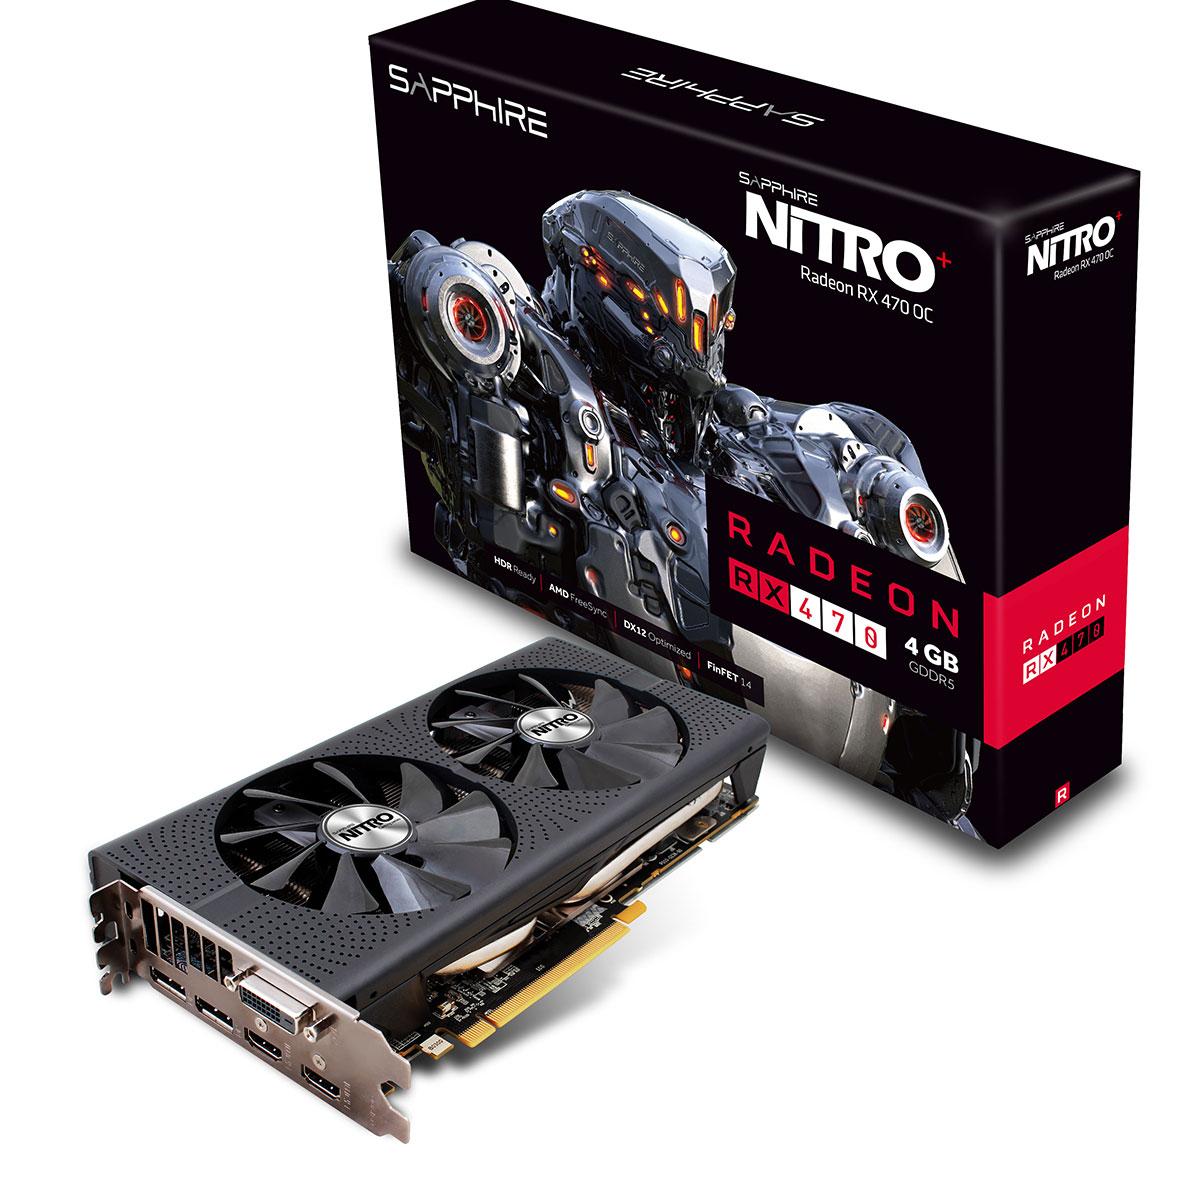 Carte graphique Sapphire NITRO+ Radeon RX 470 4GD5 (UEFI) OC 4 Go DVI/Dual HDMI/Dual DisplayPort - PCI Express (AMD Radeon RX 470)